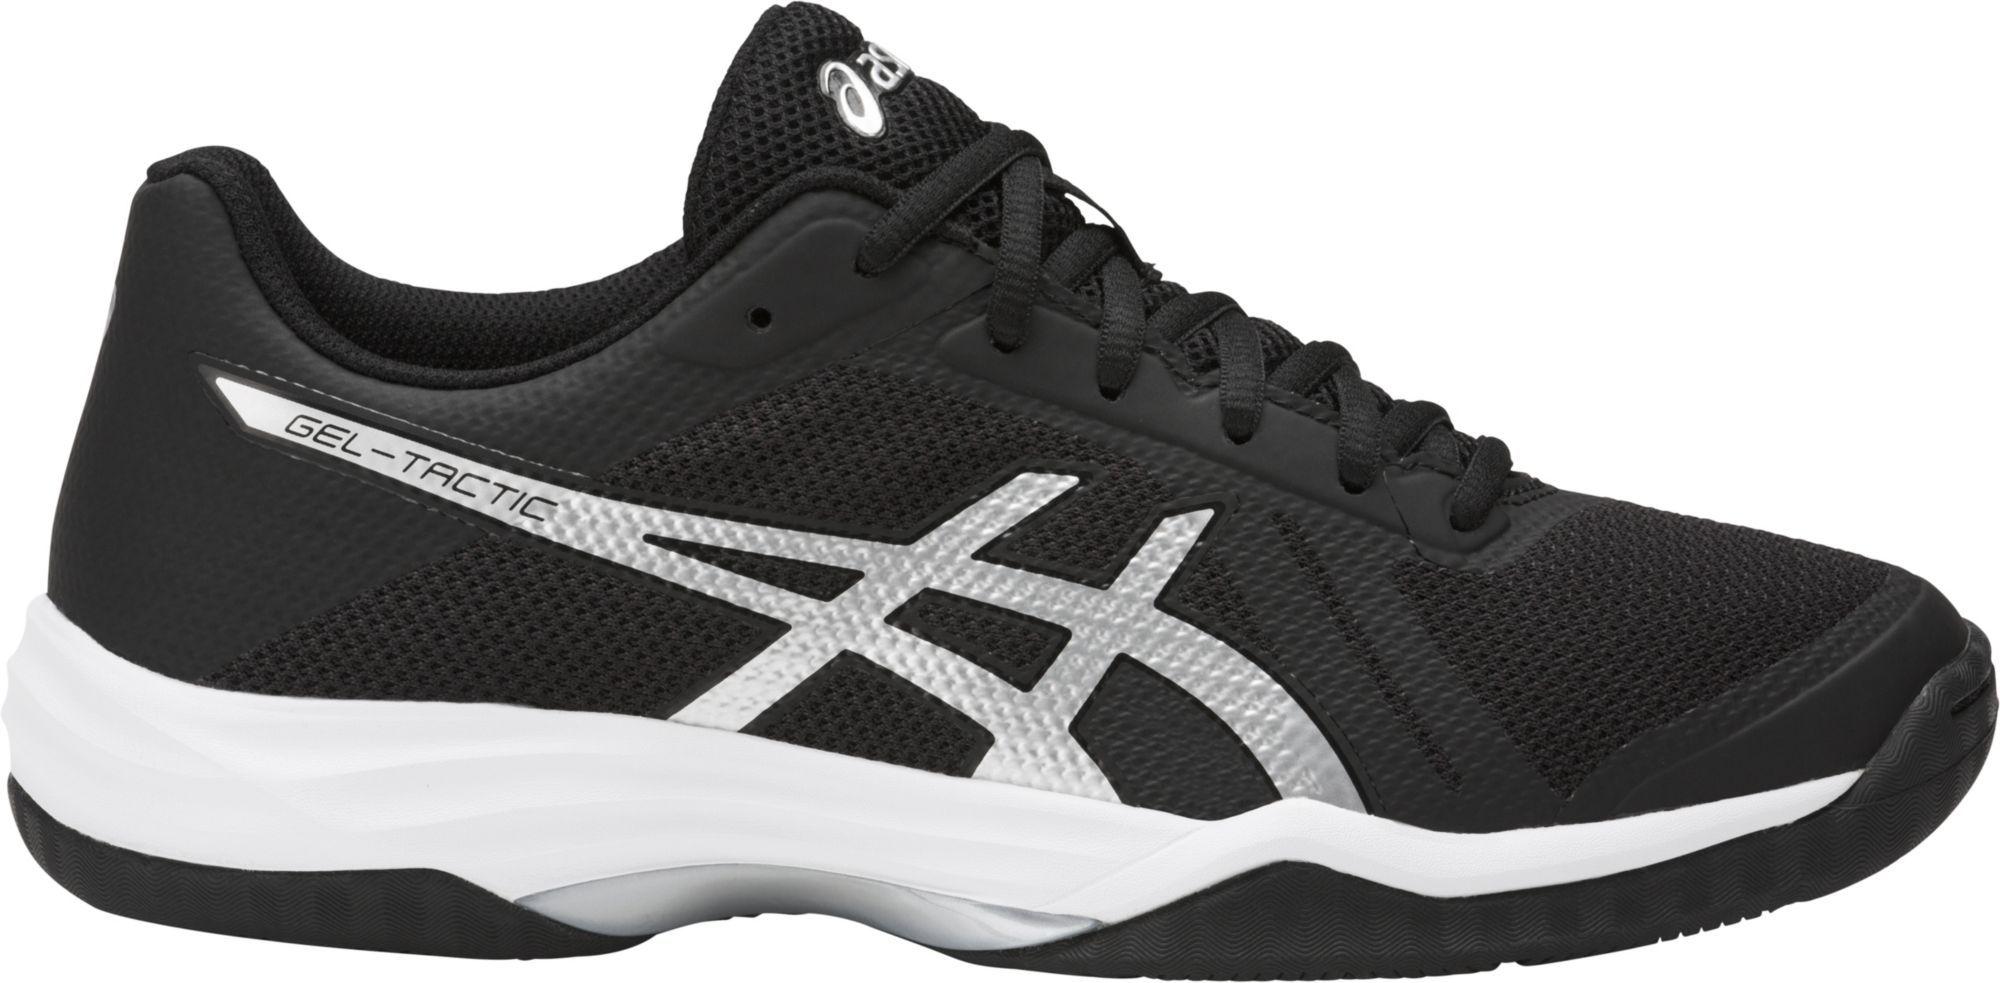 Asics Women S Gel Tactic 2 Volleyball Shoes Size 6 0 Black Volleyball Shoes Asics Volleyball Shoes Asics Women Gel